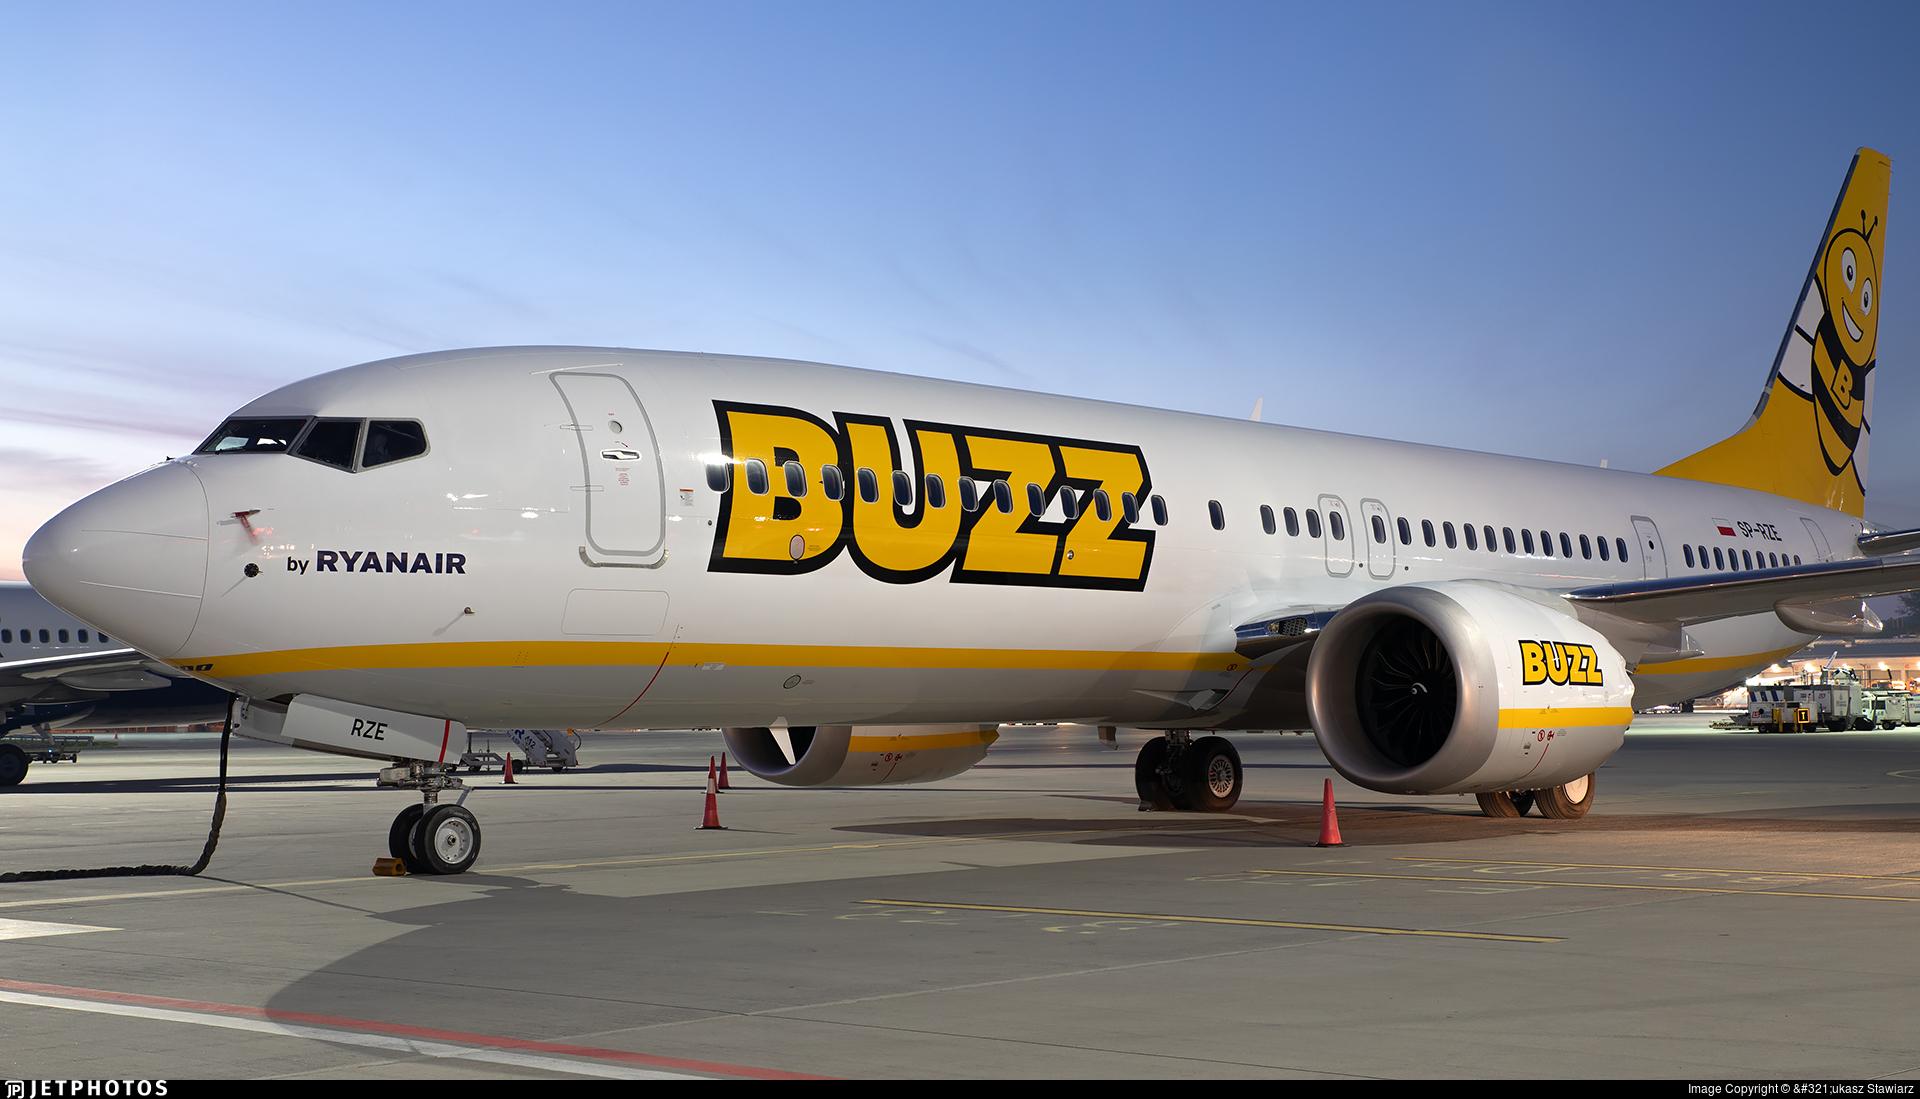 SP-RZE - Boeing 737-8-200 MAX - Buzz